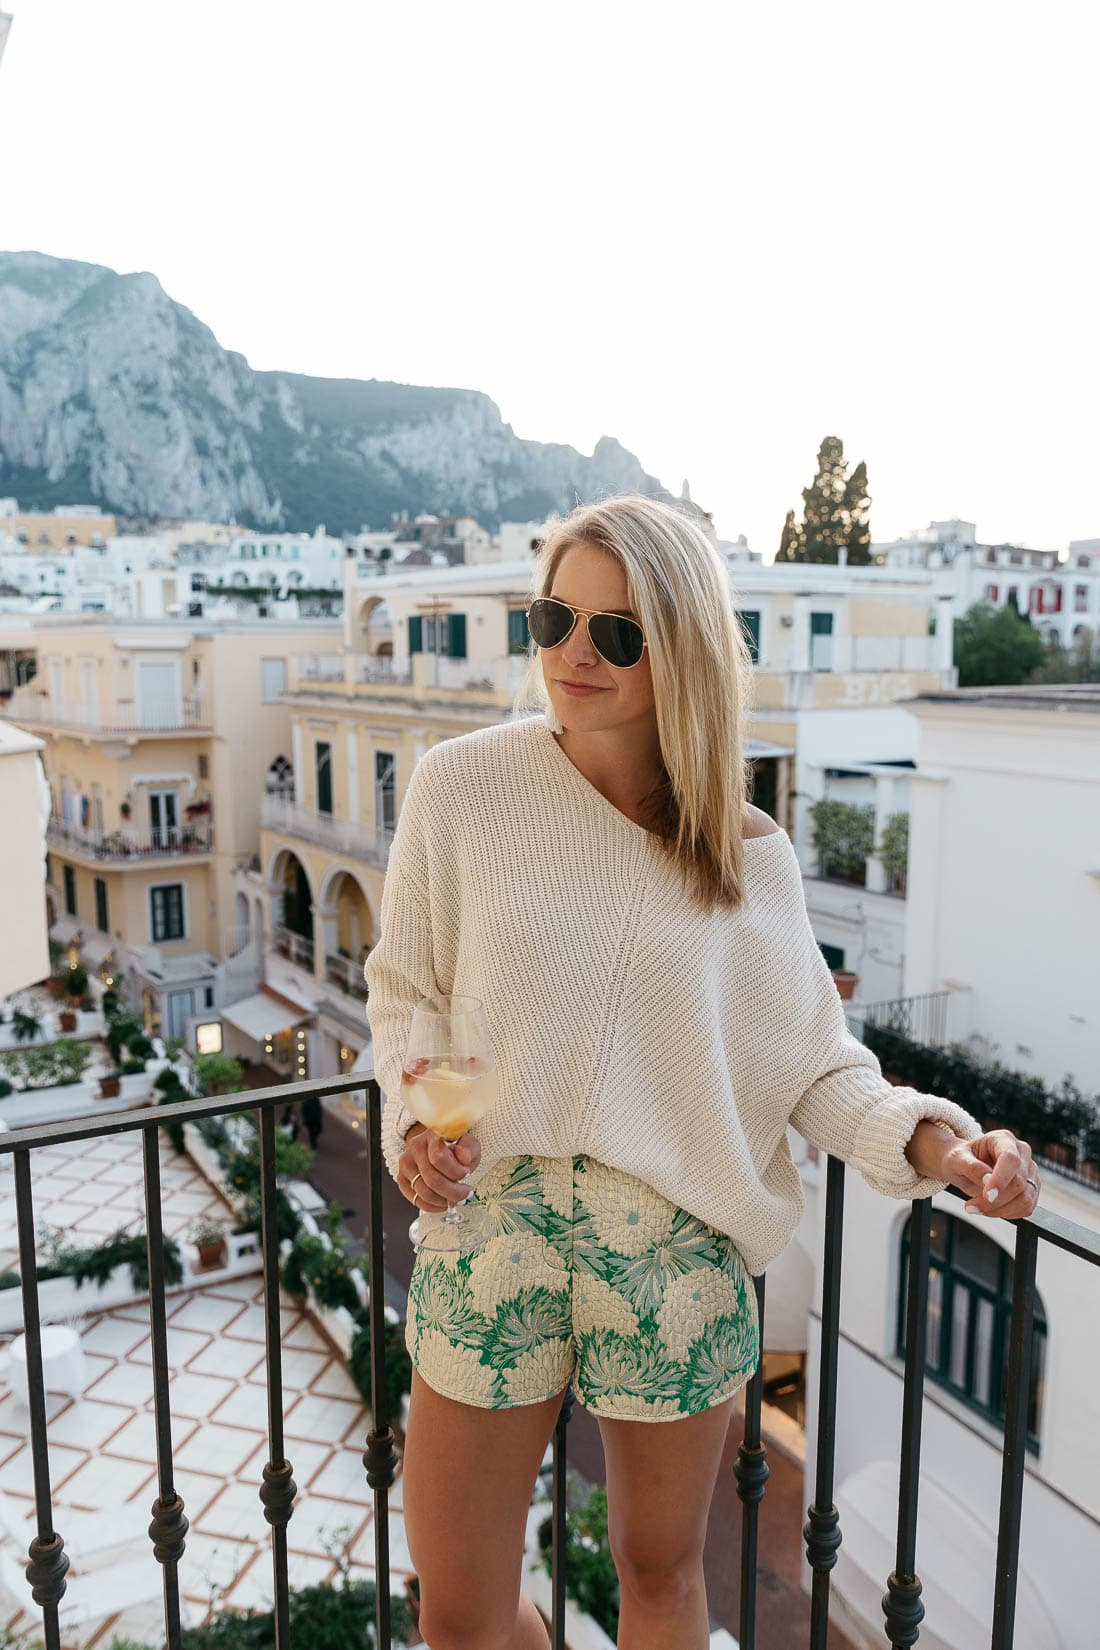 Where to stay in Capri